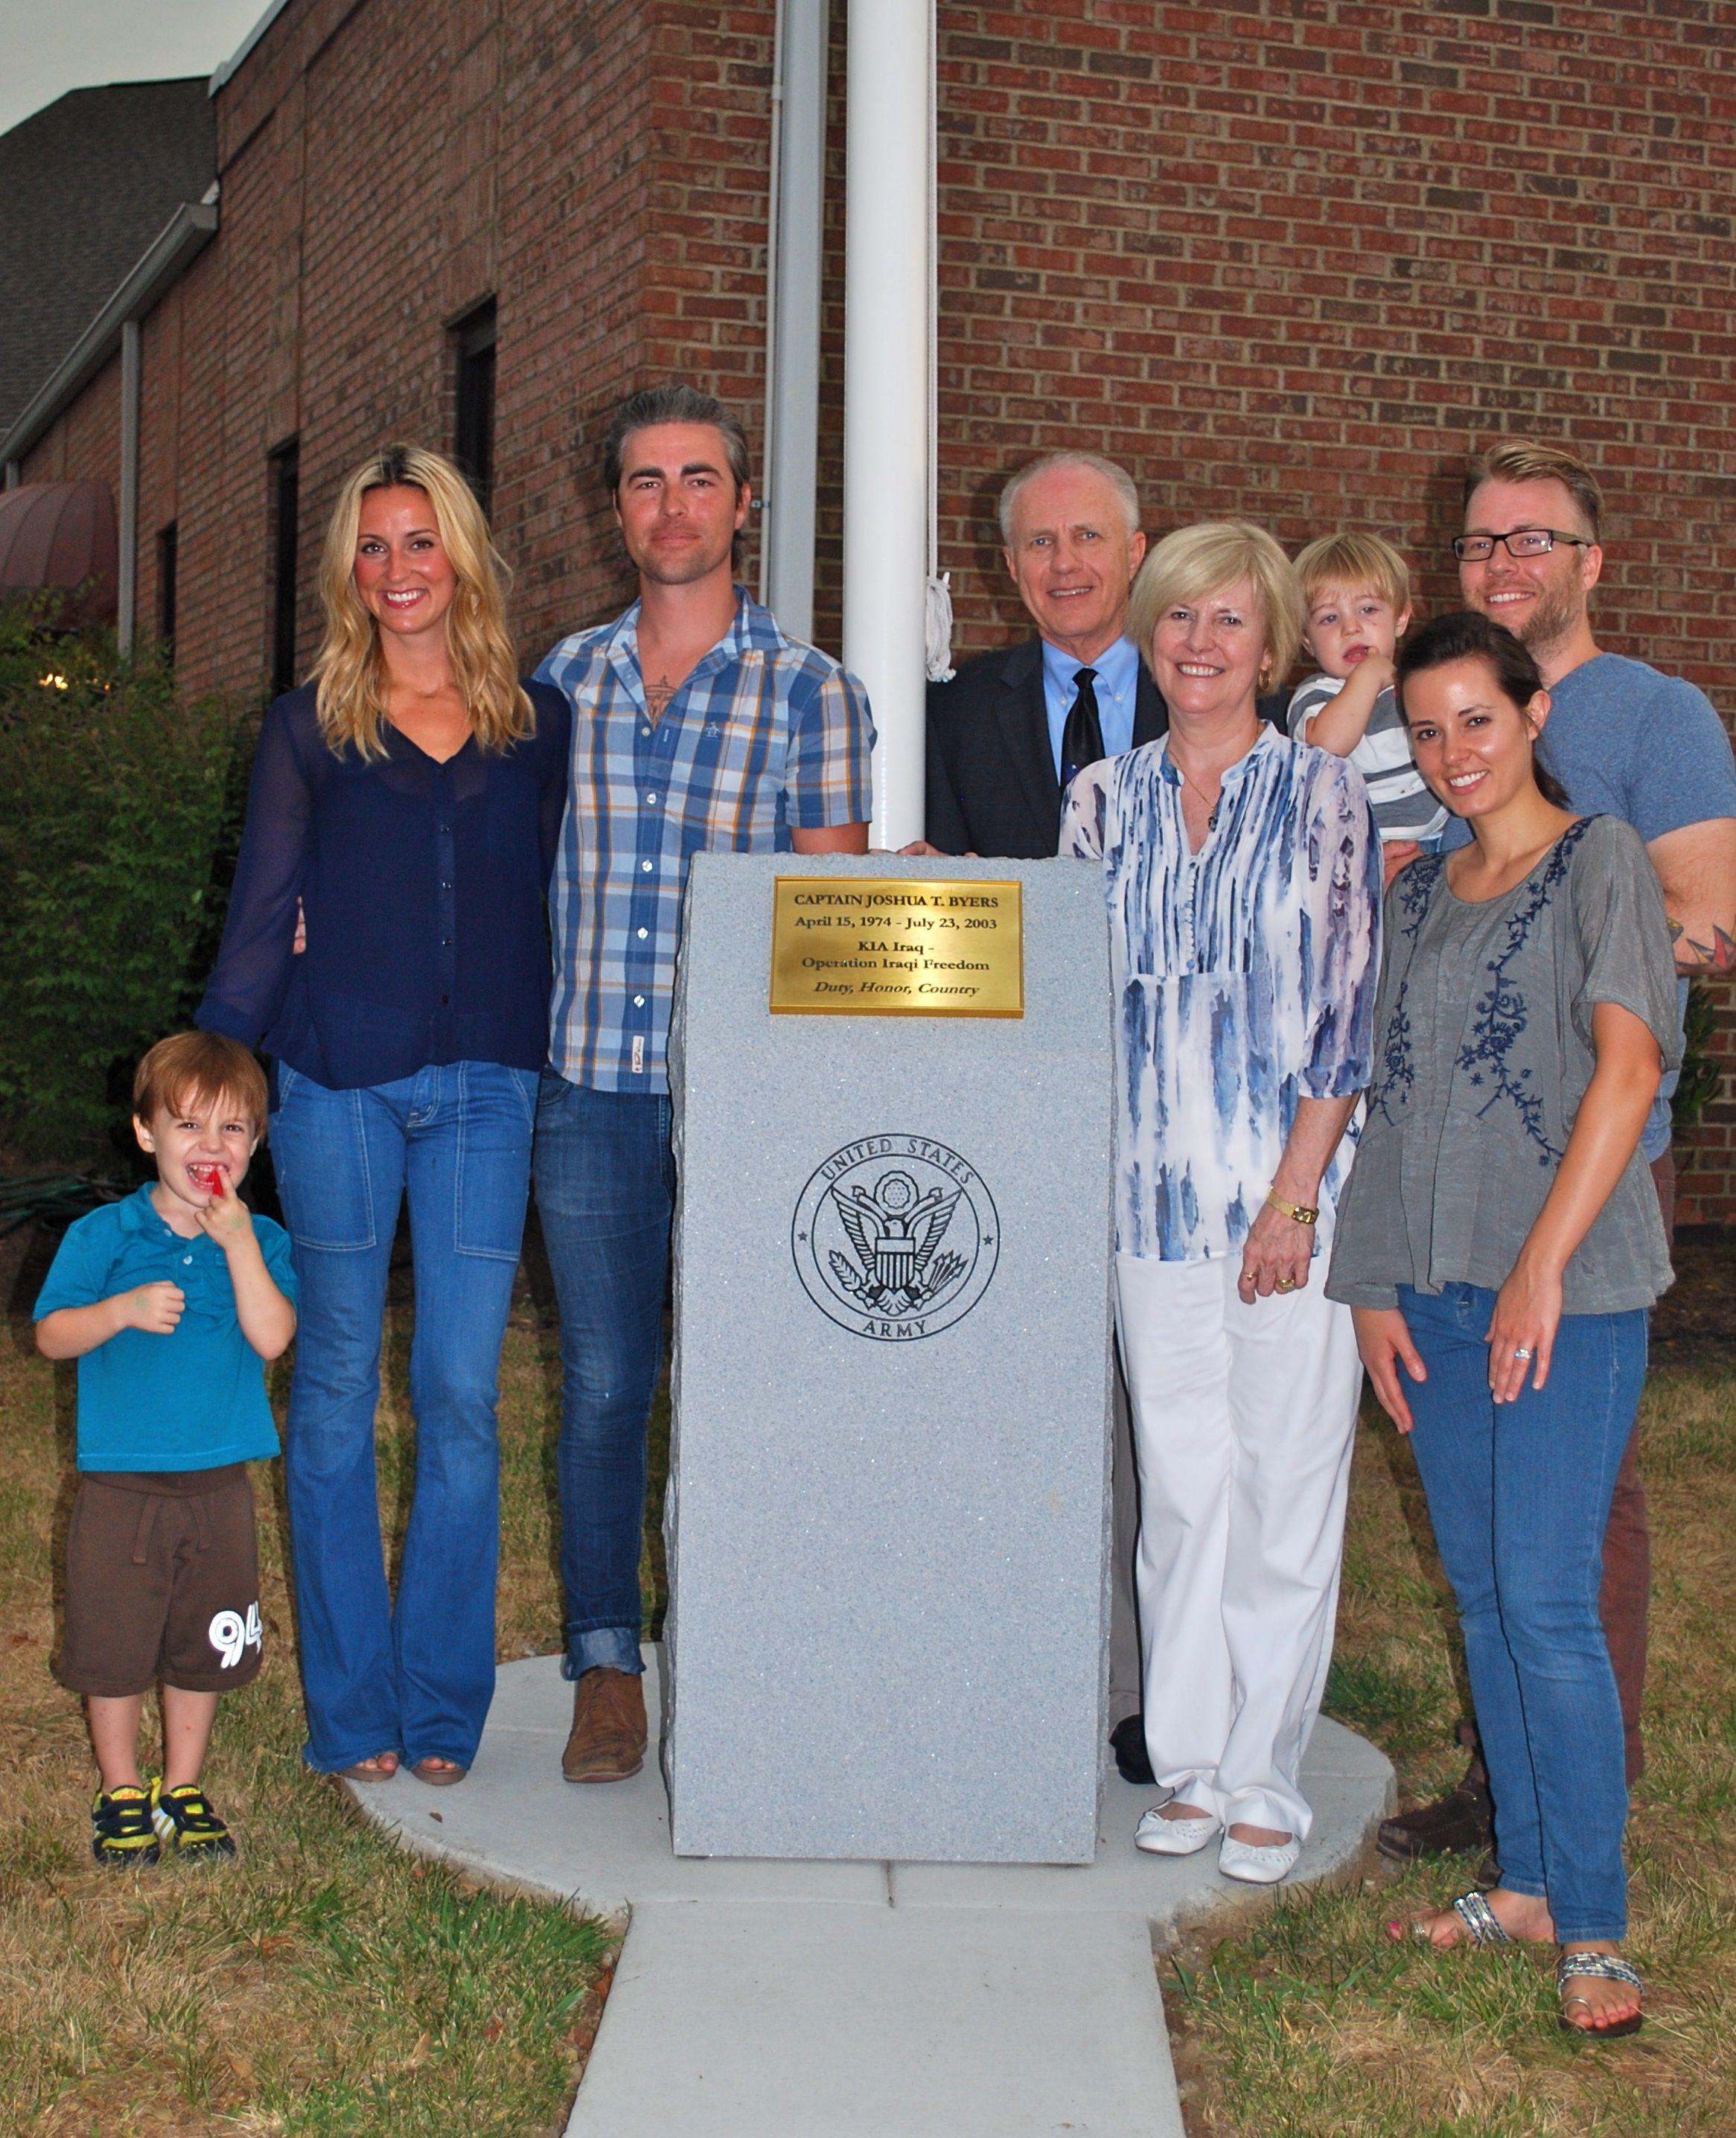 The Byers family at Trinity Baptist Church flagpole dedication. 2012